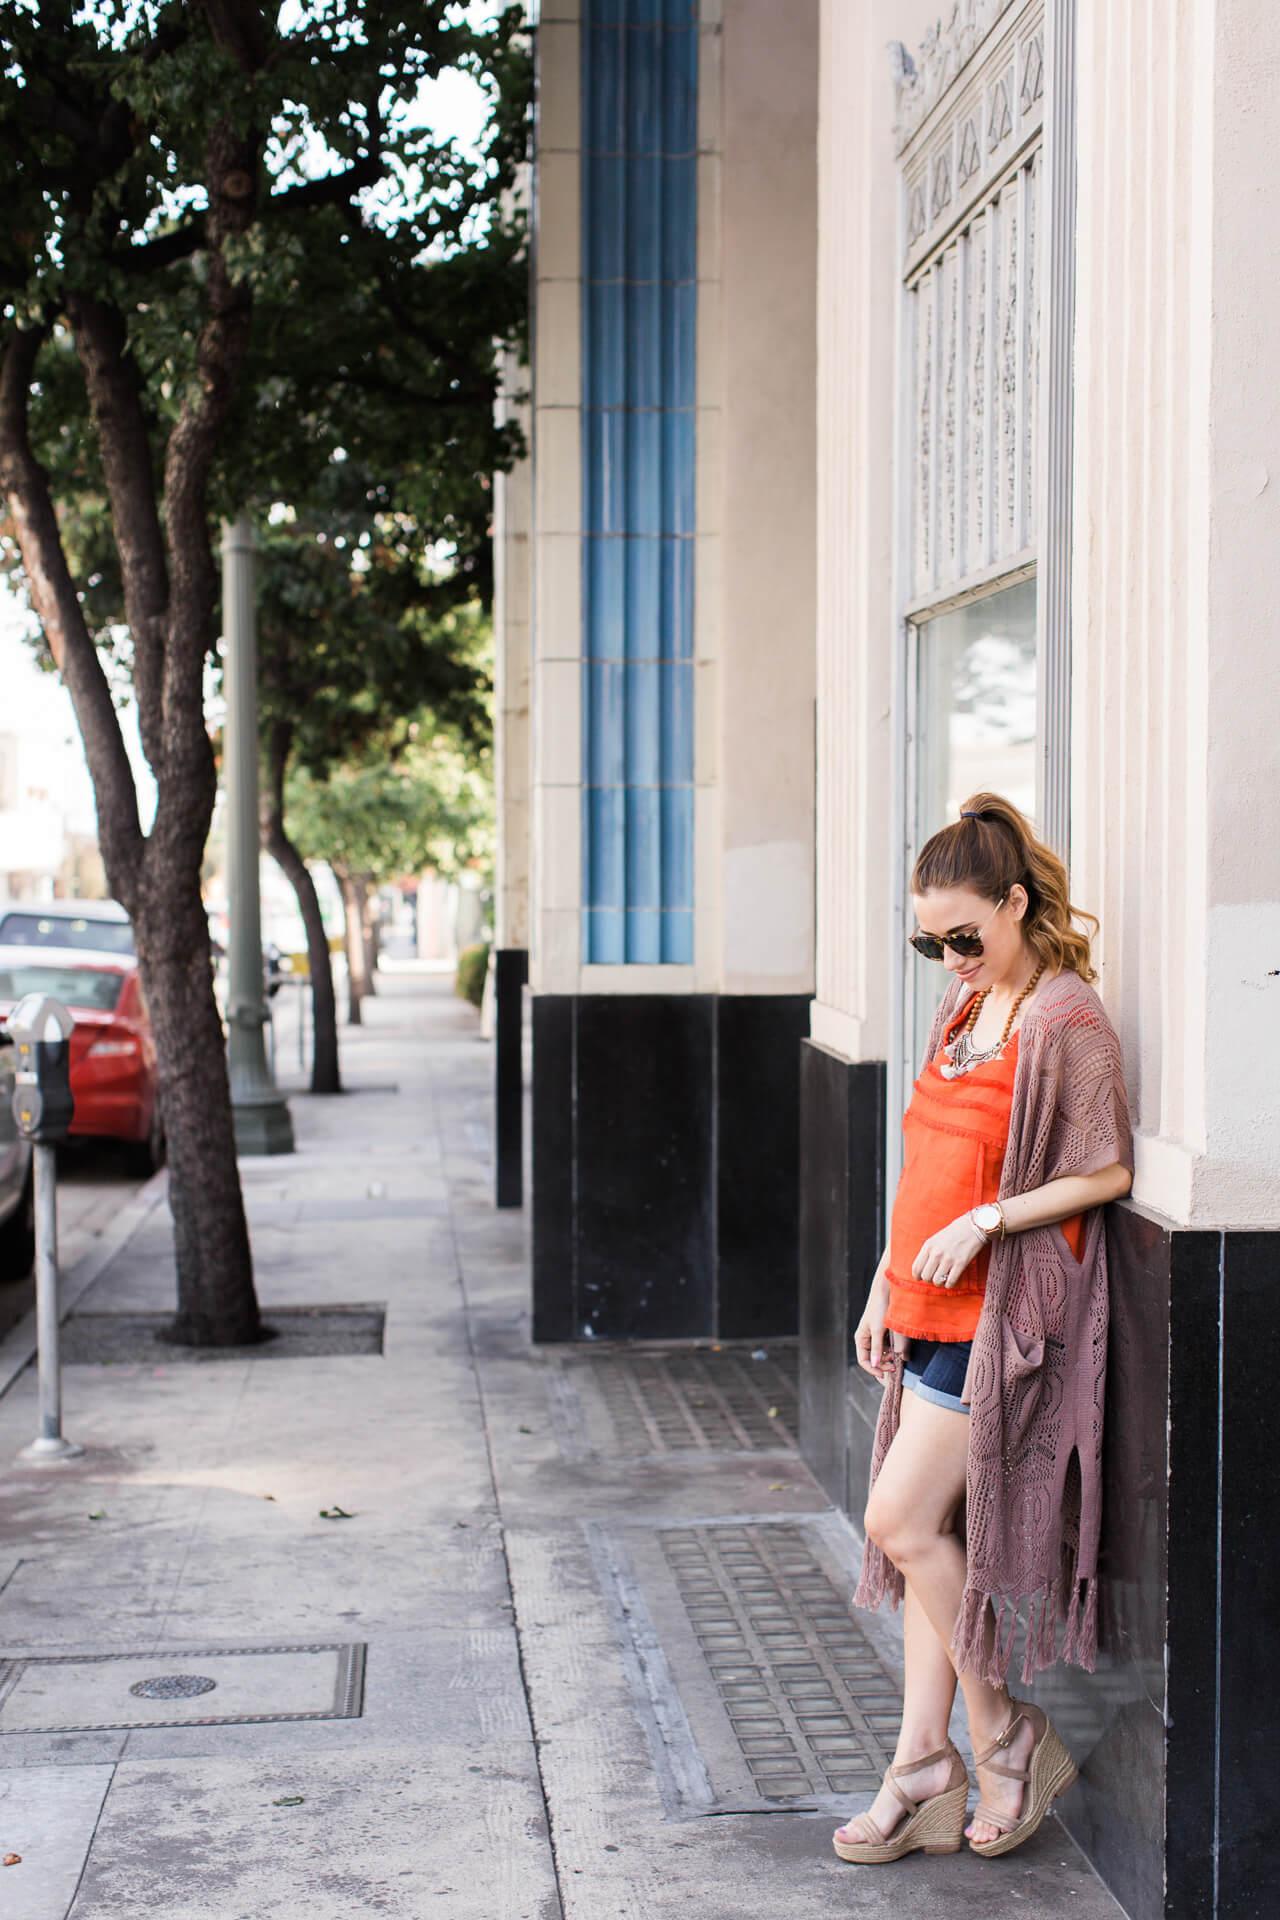 summer maternity outfit inspiration with orange fringe tank, denim shorts, and maxi cardigan